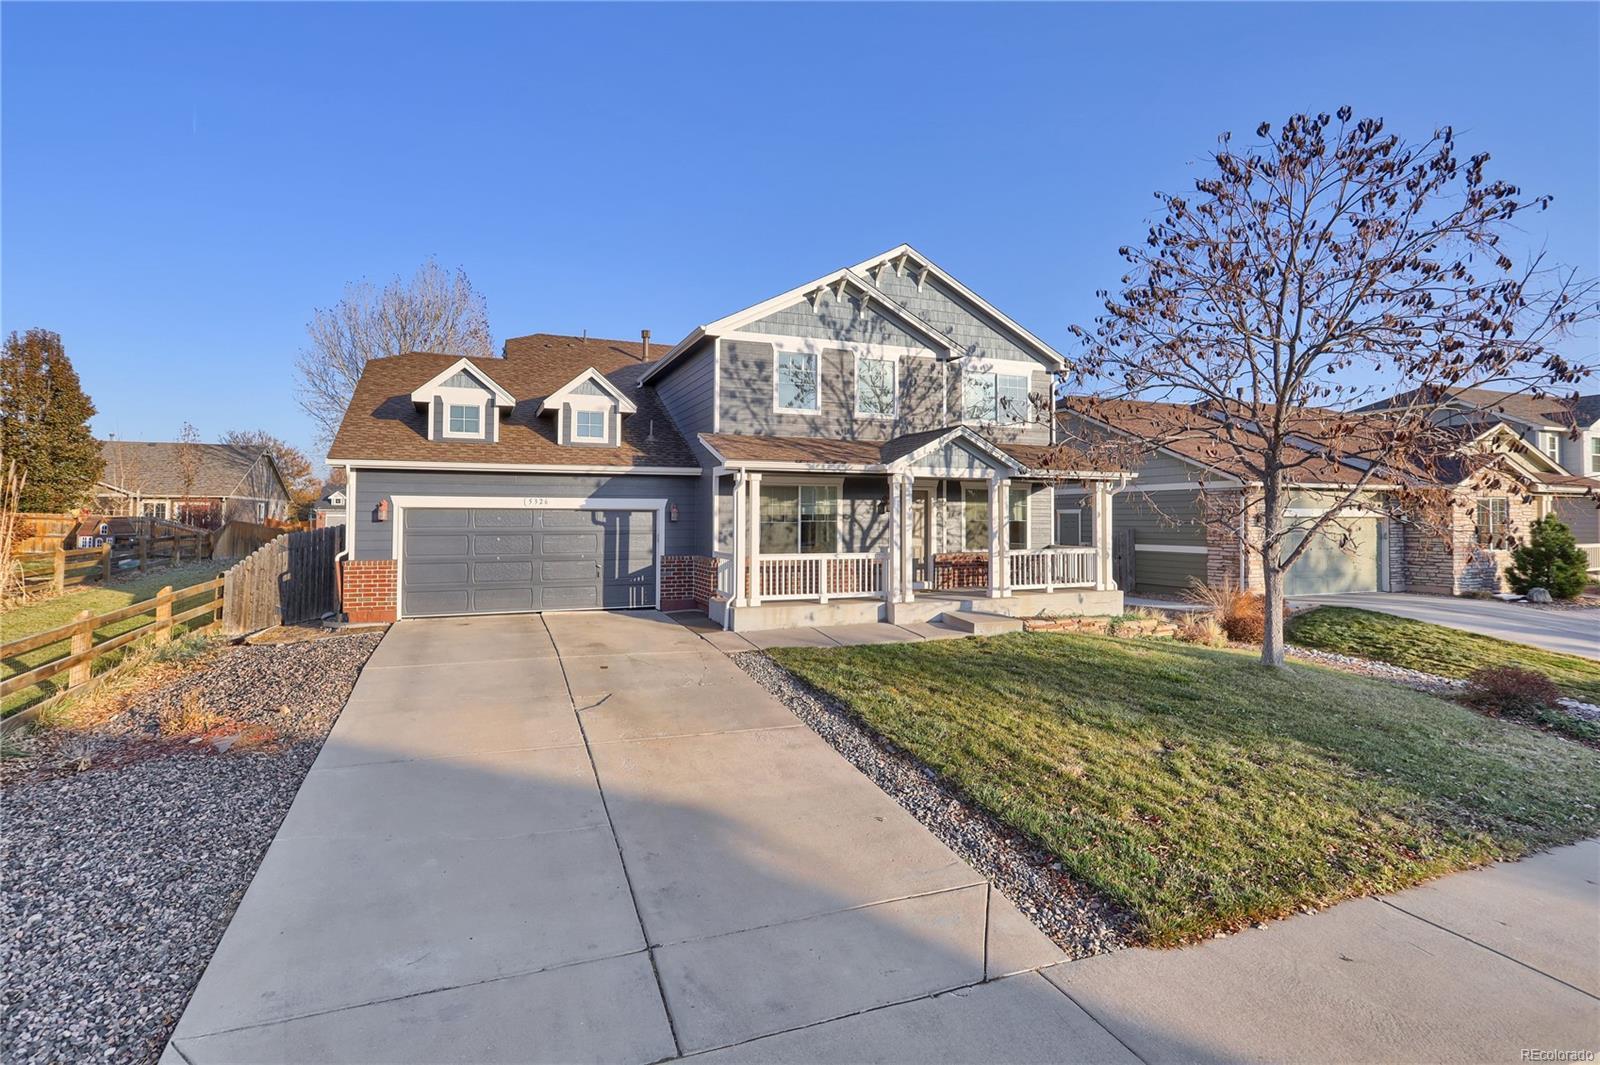 5326 Oak Court, Arvada, CO 80002 - Arvada, CO real estate listing